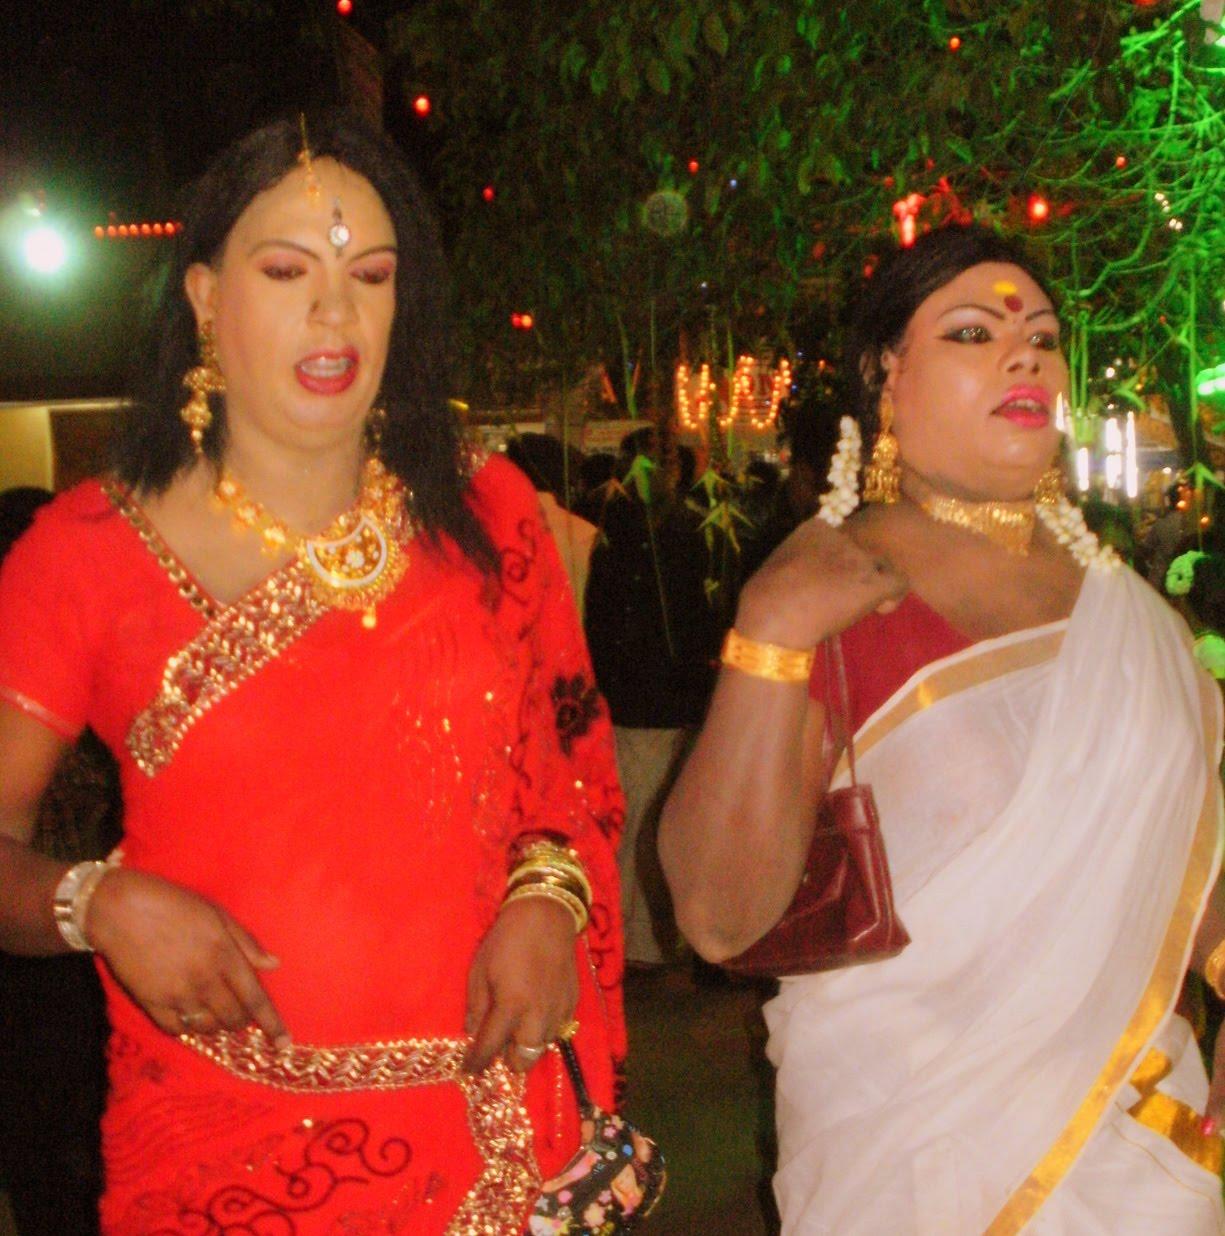 Chamayavilakku Photos: Men In Drag: Beautiful Indian Women